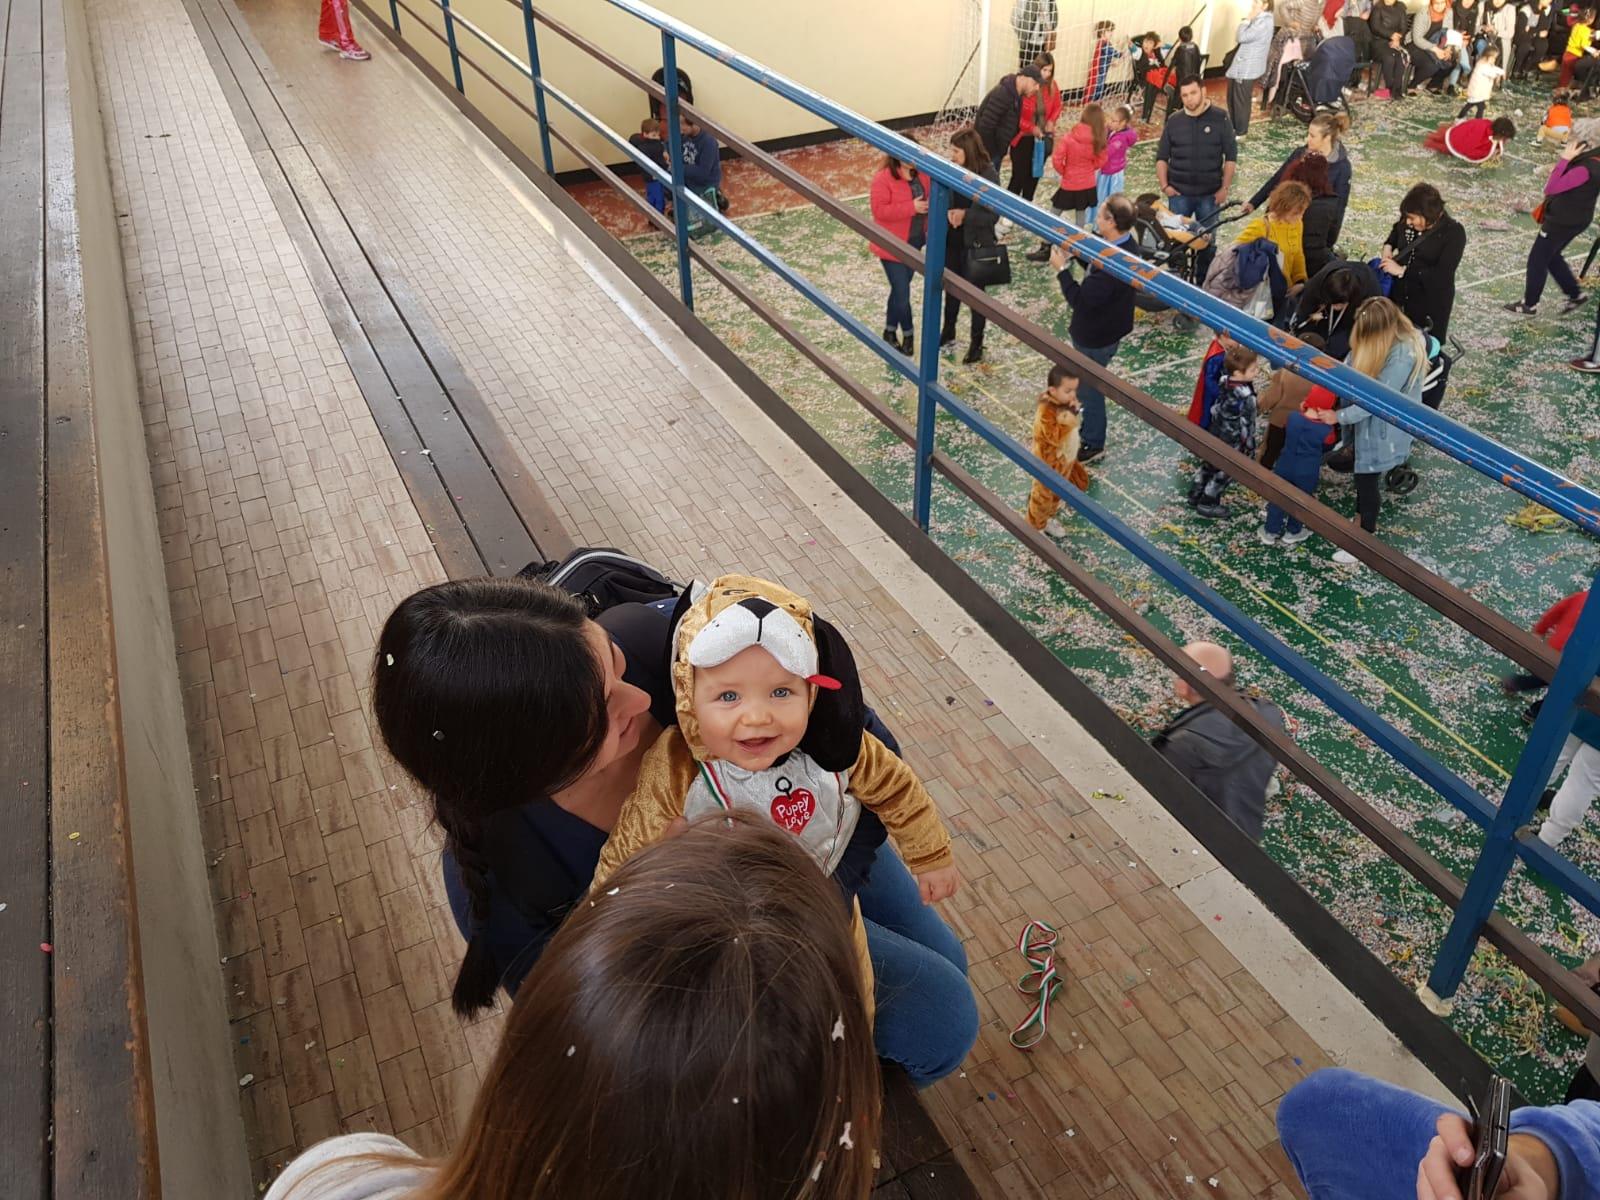 Baraonda Carnevale 2019 (291)